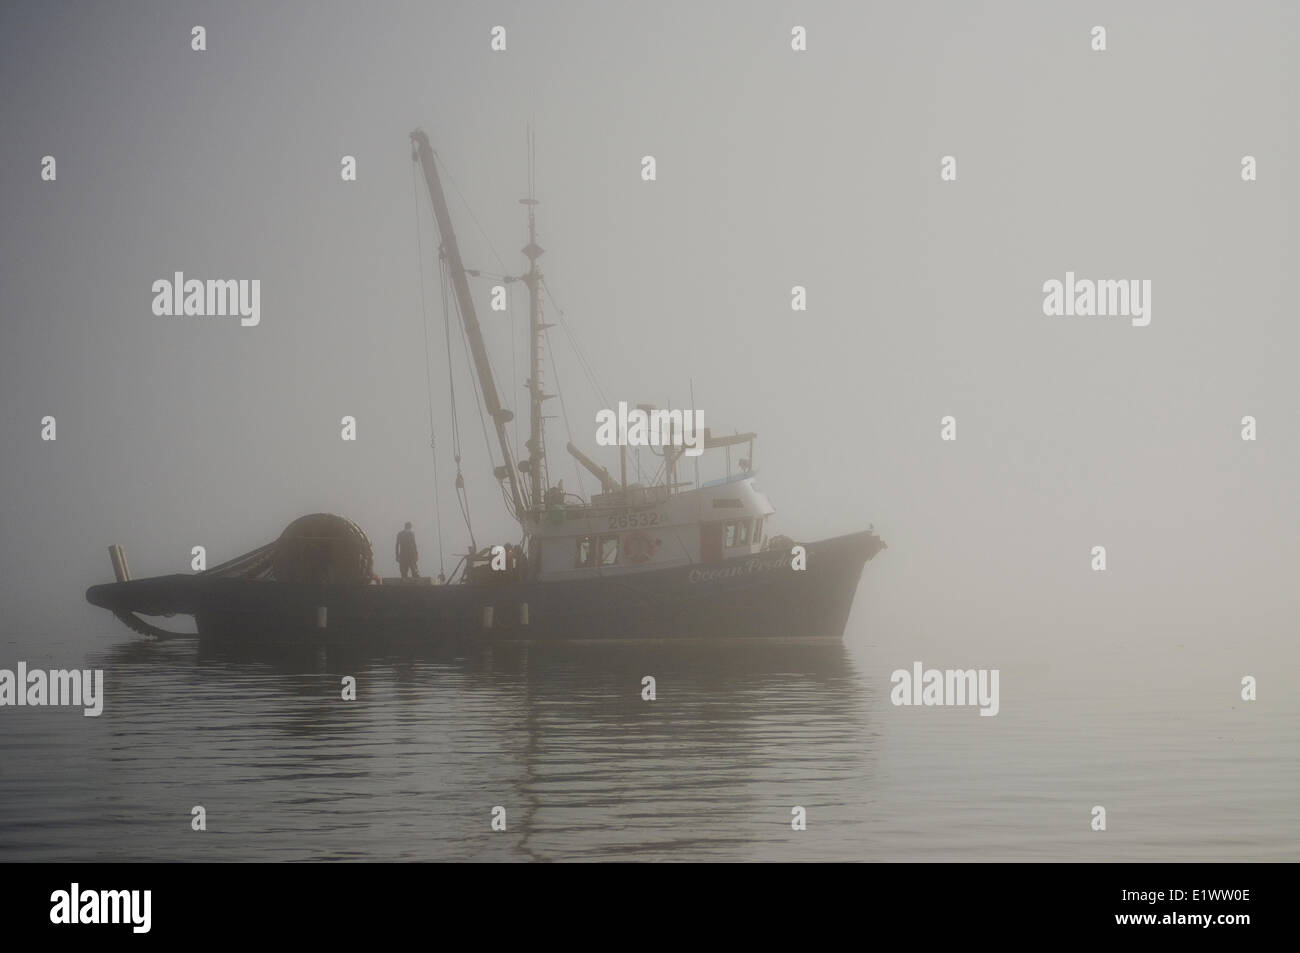 Fishing boat, Johnstone Strait, Vancouver Island, British Columbia, Canada. - Stock Image